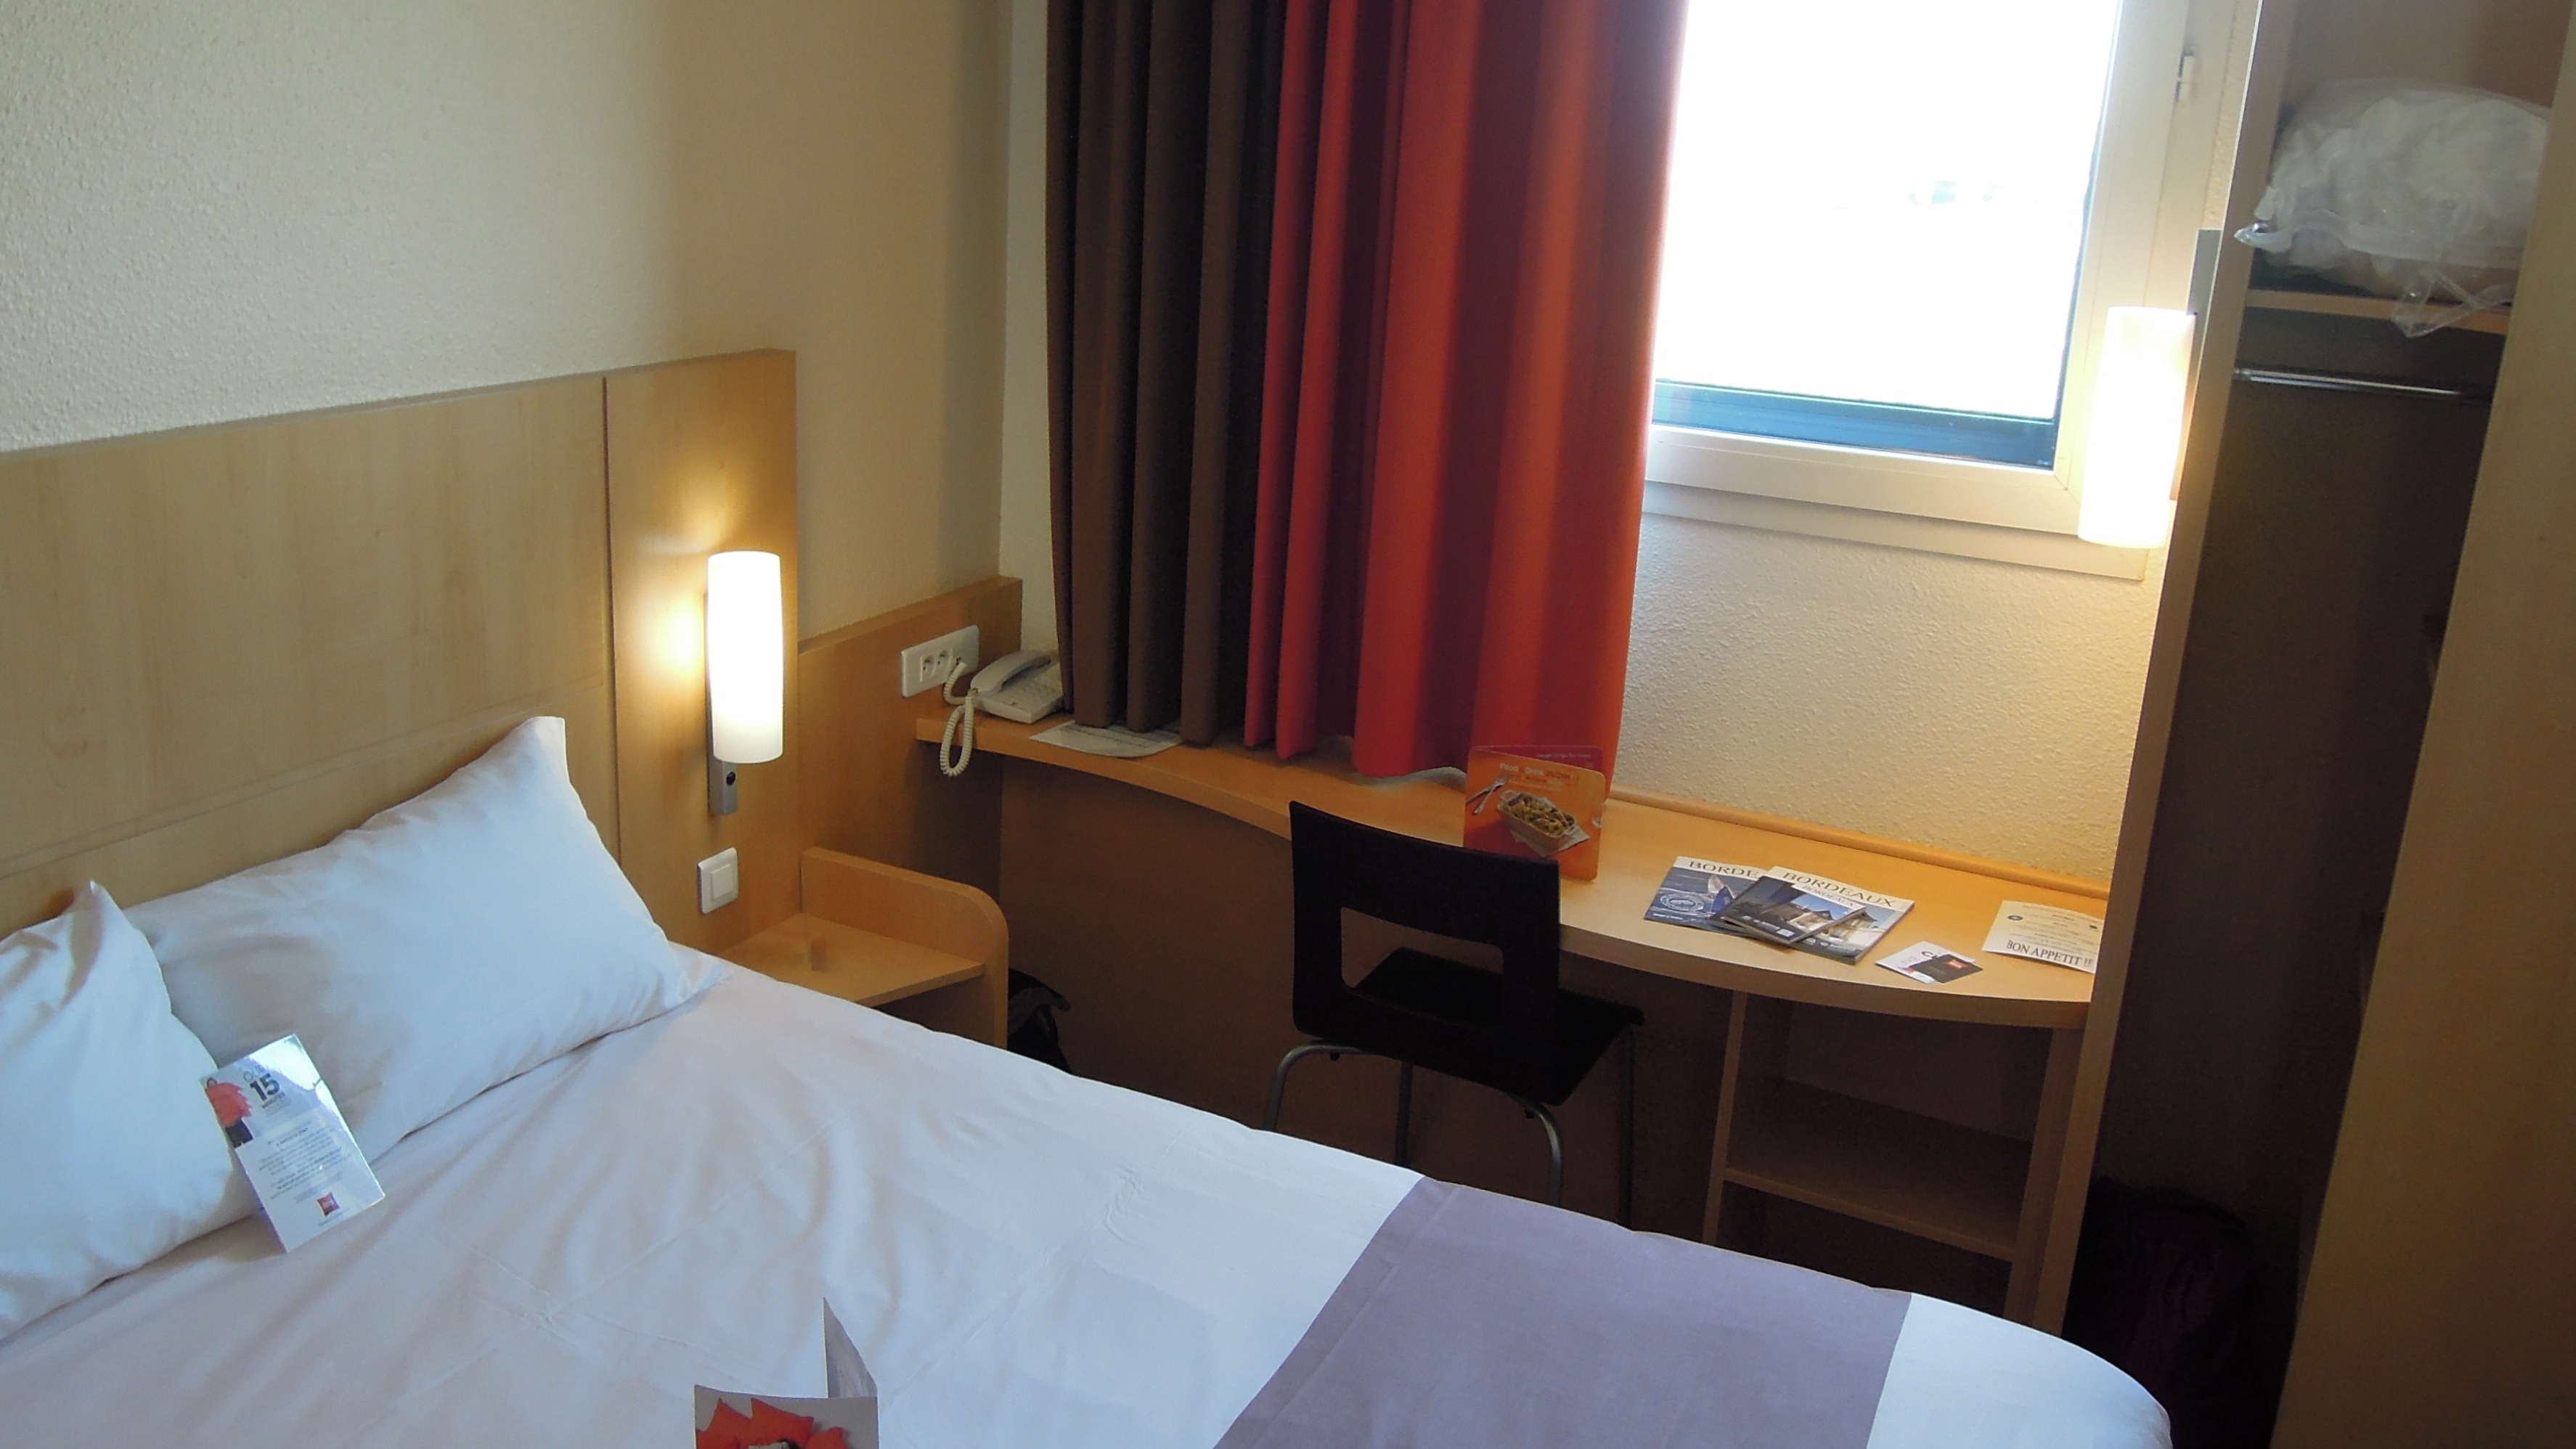 Hotel Ibis Bordeaux